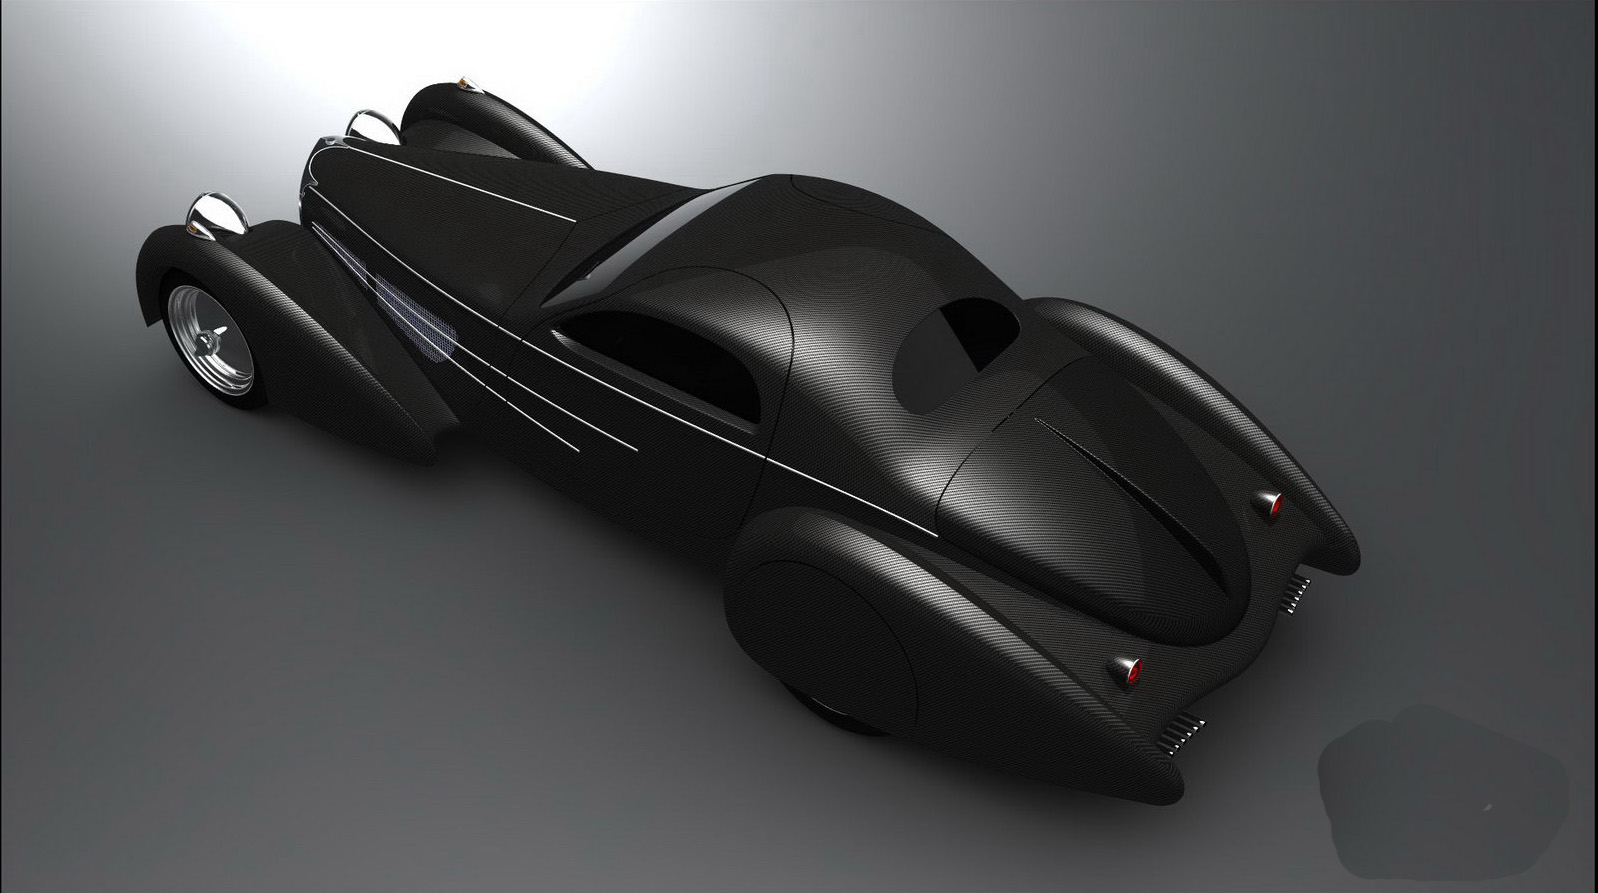 2010 delahaye usa bella figura bugnotii type 57s roadster